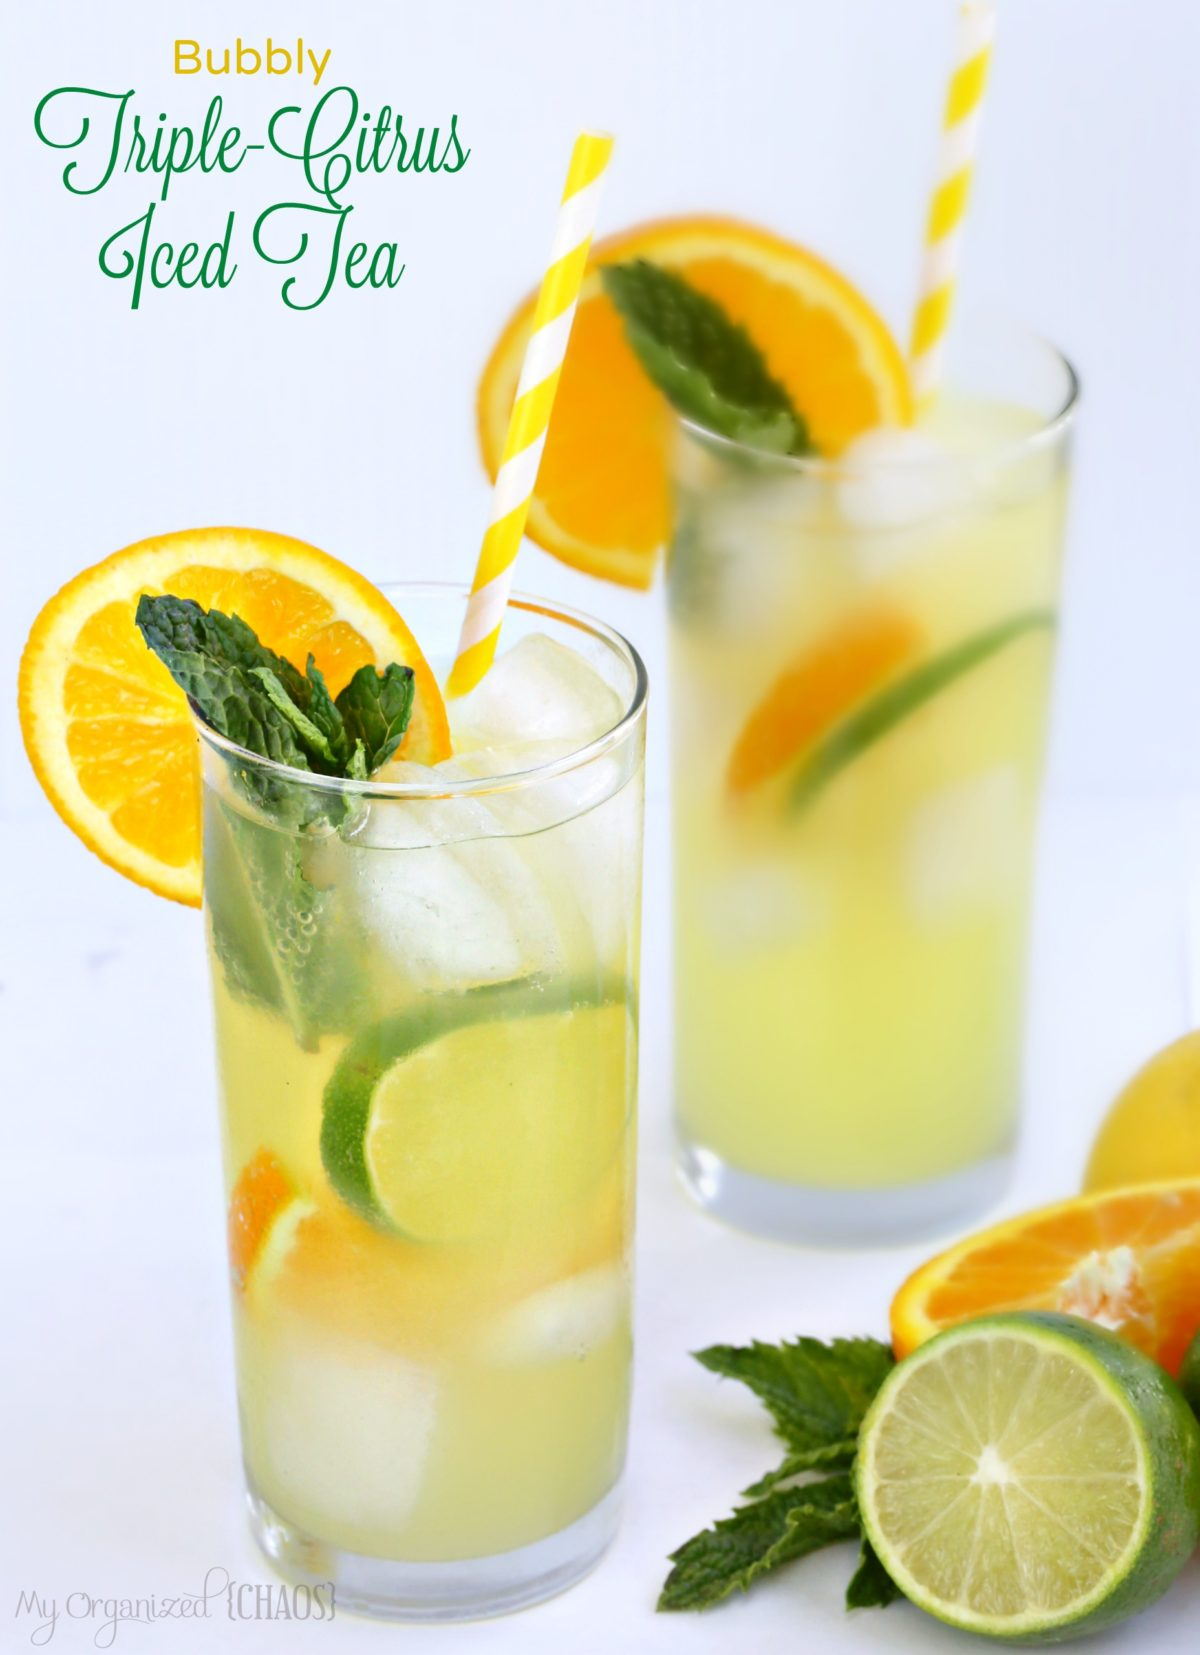 Bubbly-Triple-Citrus-Iced-Tea-e1467577788356